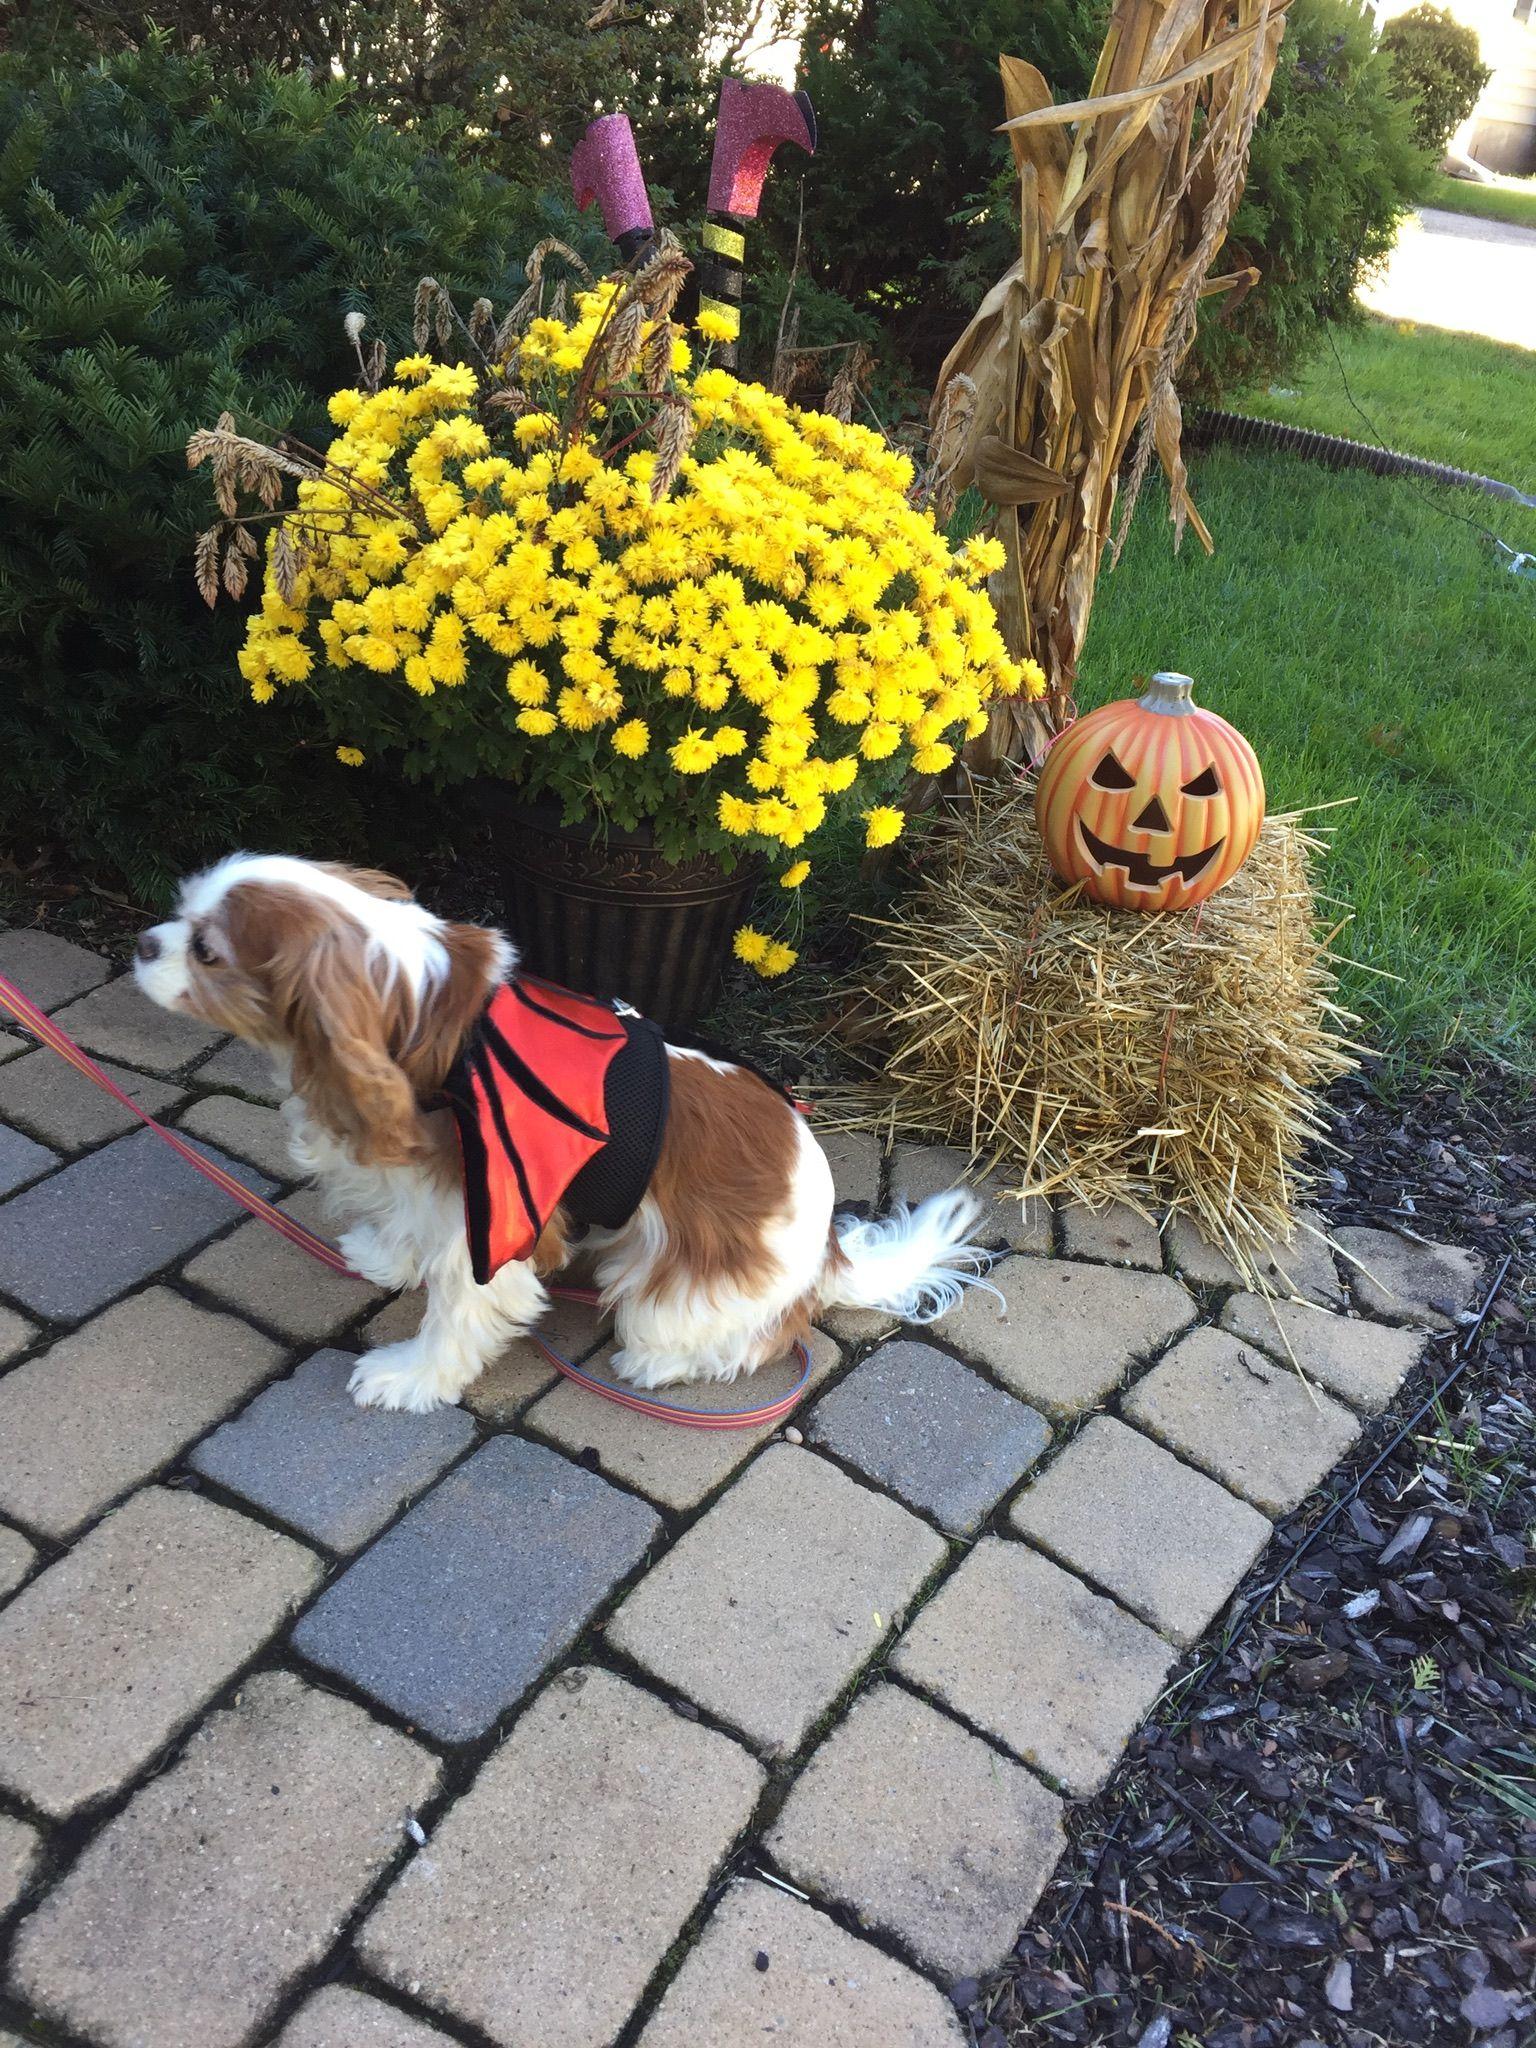 Ginger dressed up for Halloween.